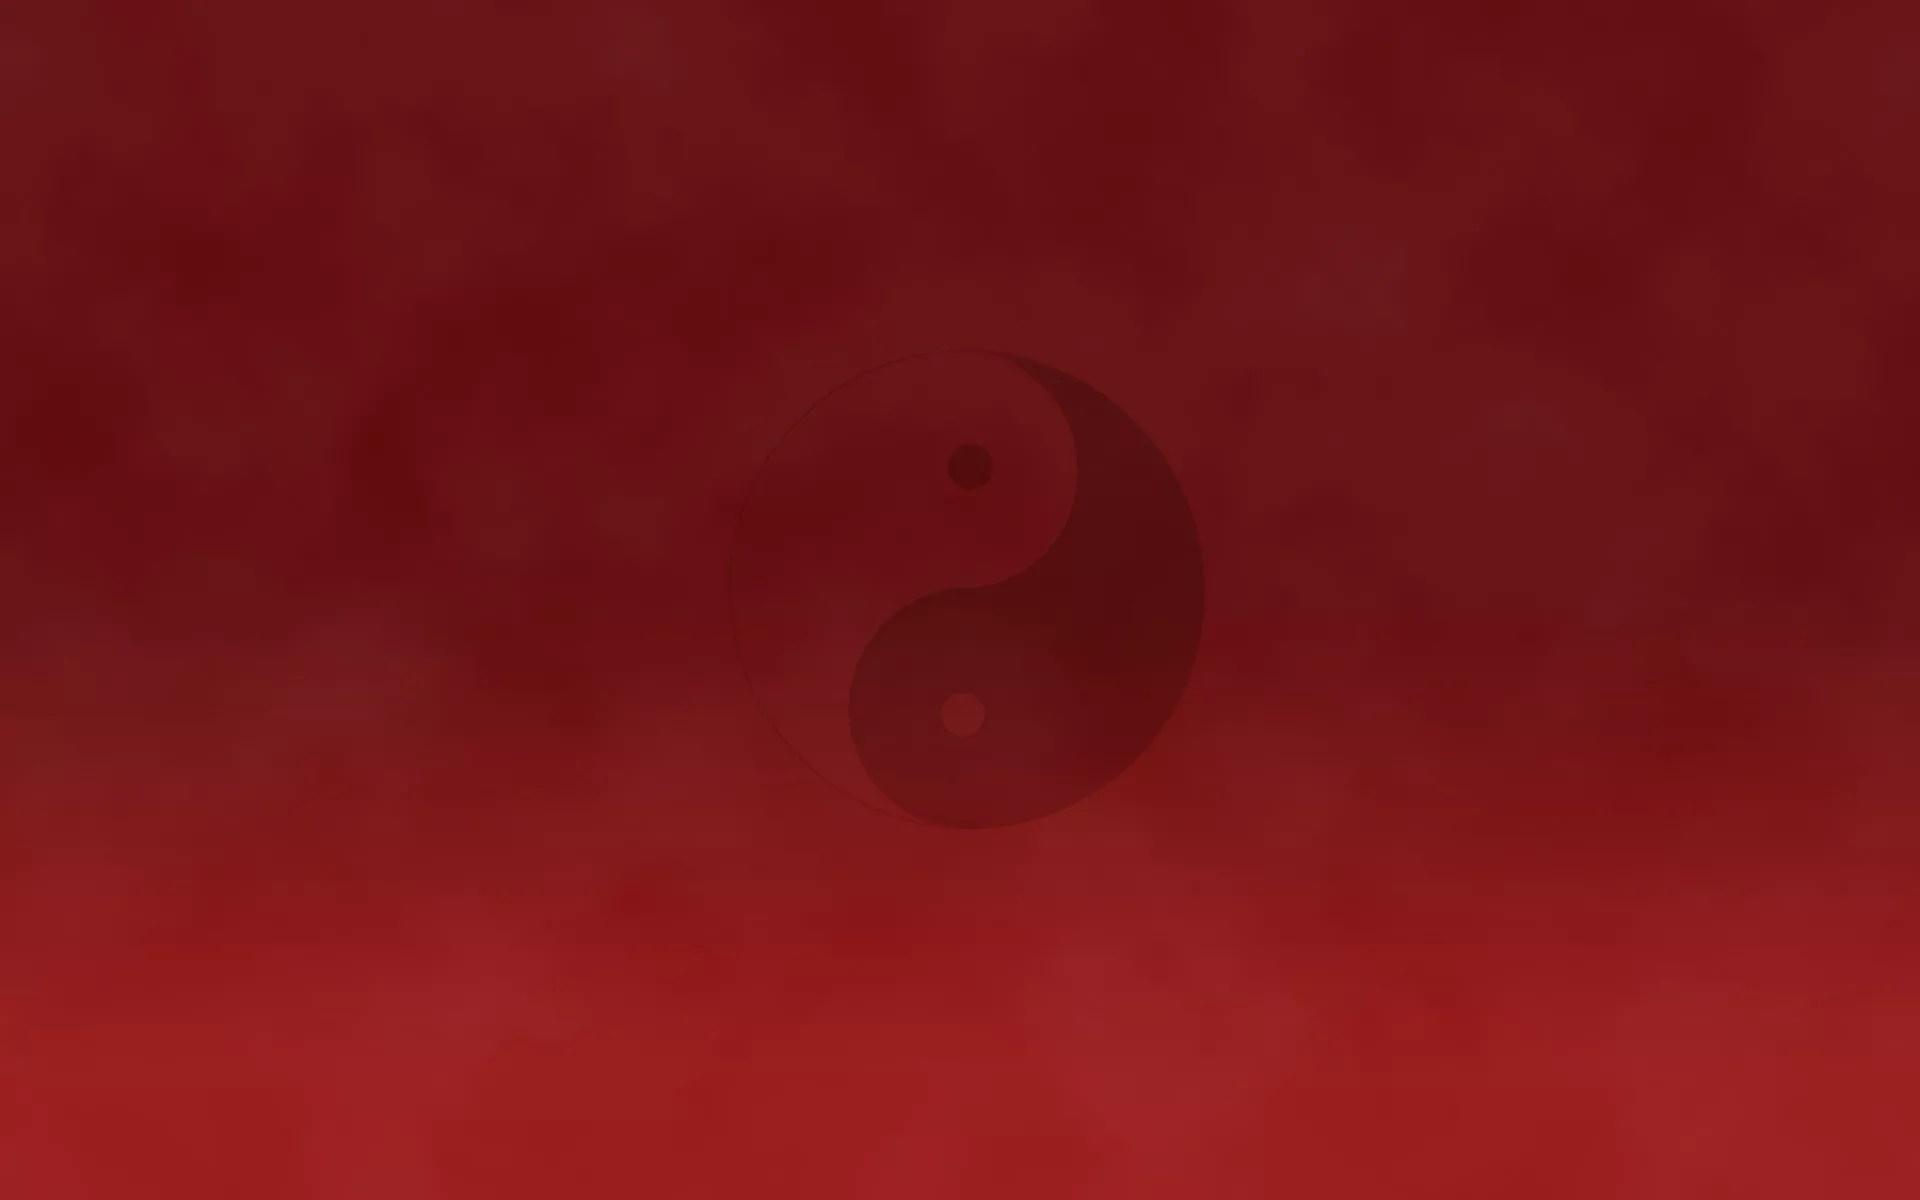 Vier harmonische DesktopHintergrundbilder  FengShui